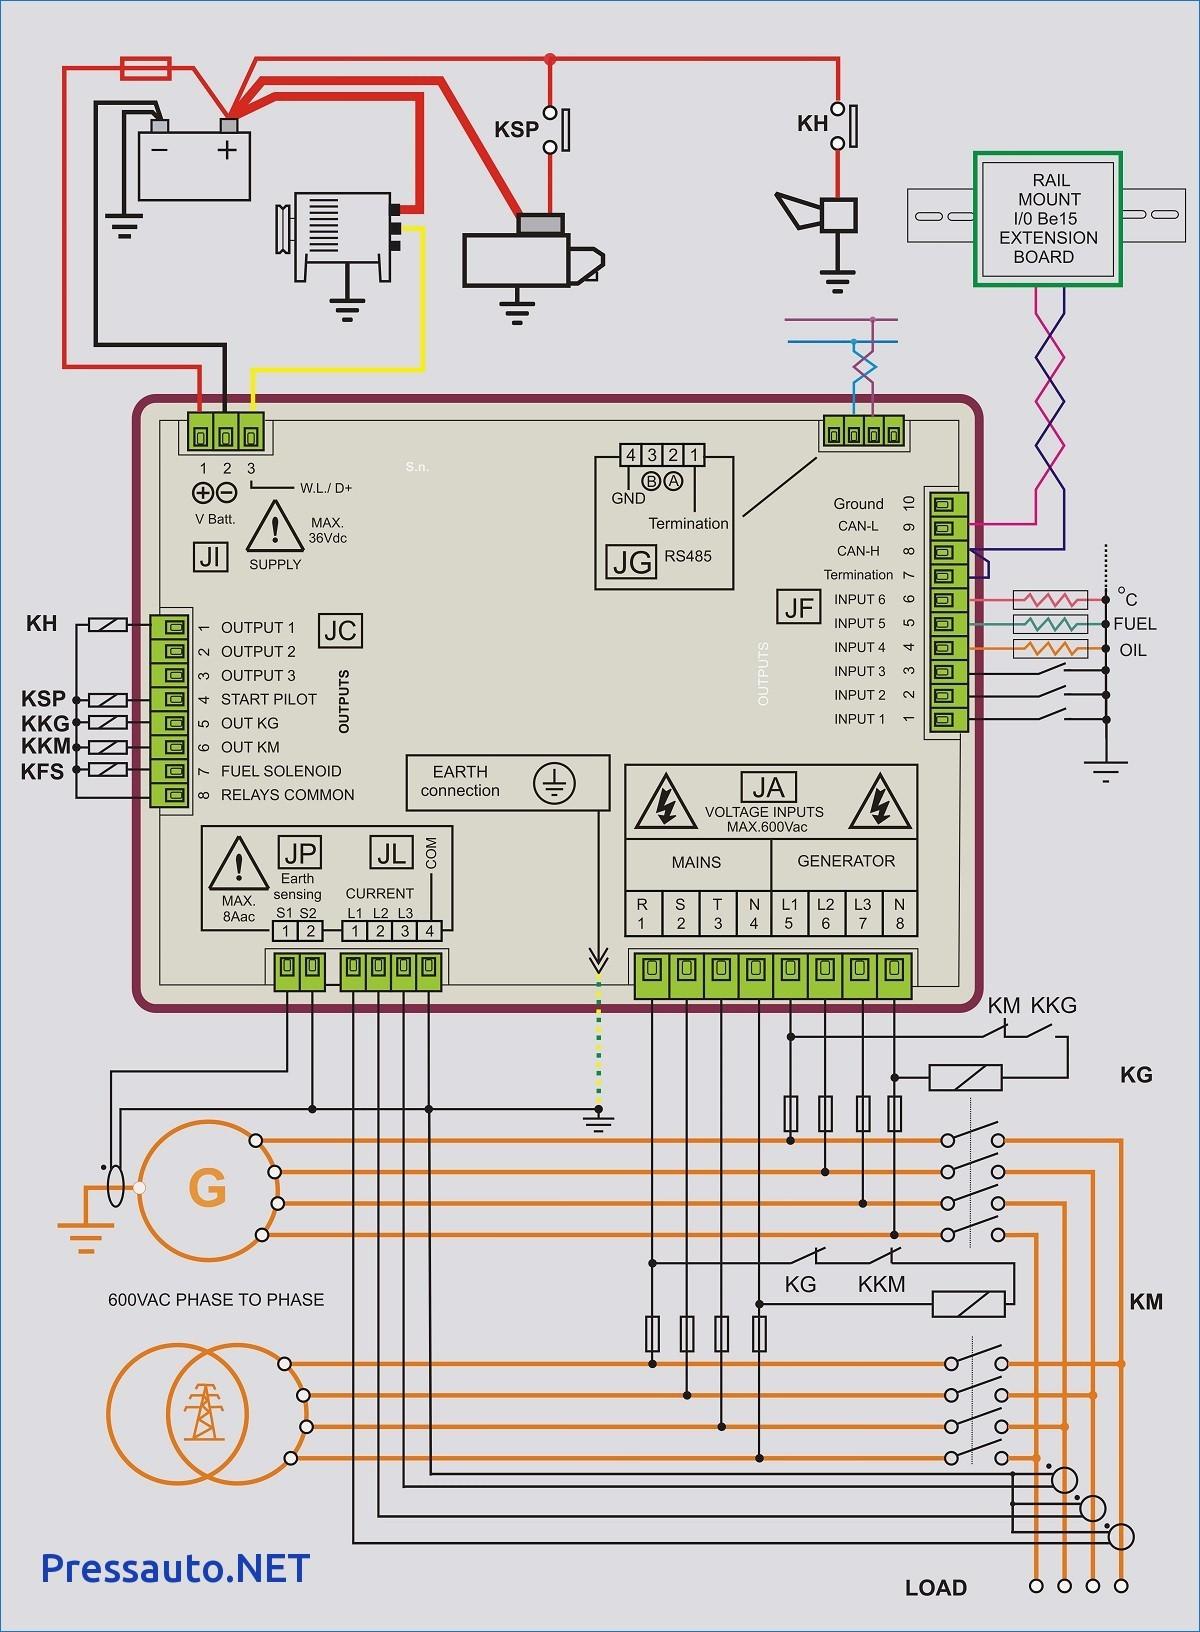 RR_7061] Generac Wiring Diagram 420Cc Wiring Diagram | Generac 15000 Portable Generator Wiring Diagram |  | Phot Phae Mohammedshrine Librar Wiring 101